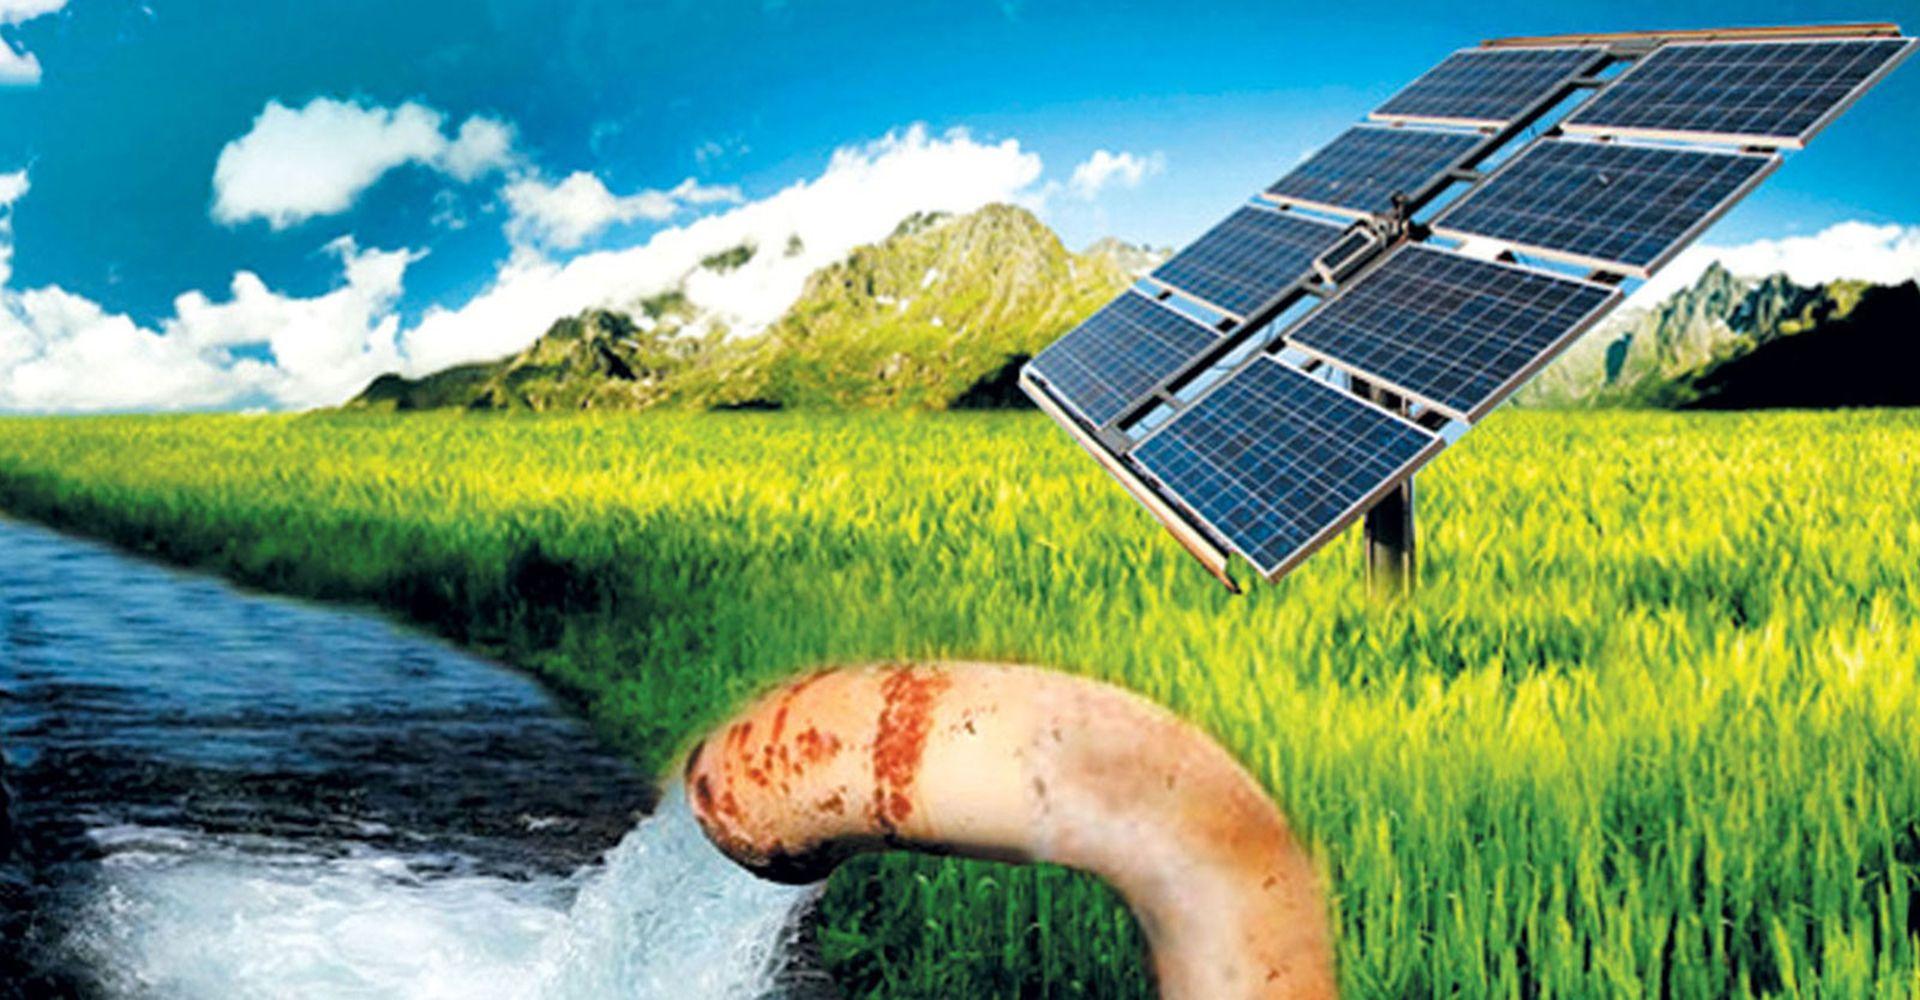 Pin By Bm Sunpower Technologies On Http Bmsolar In Solar Water Pump Solar Water Water Pumps